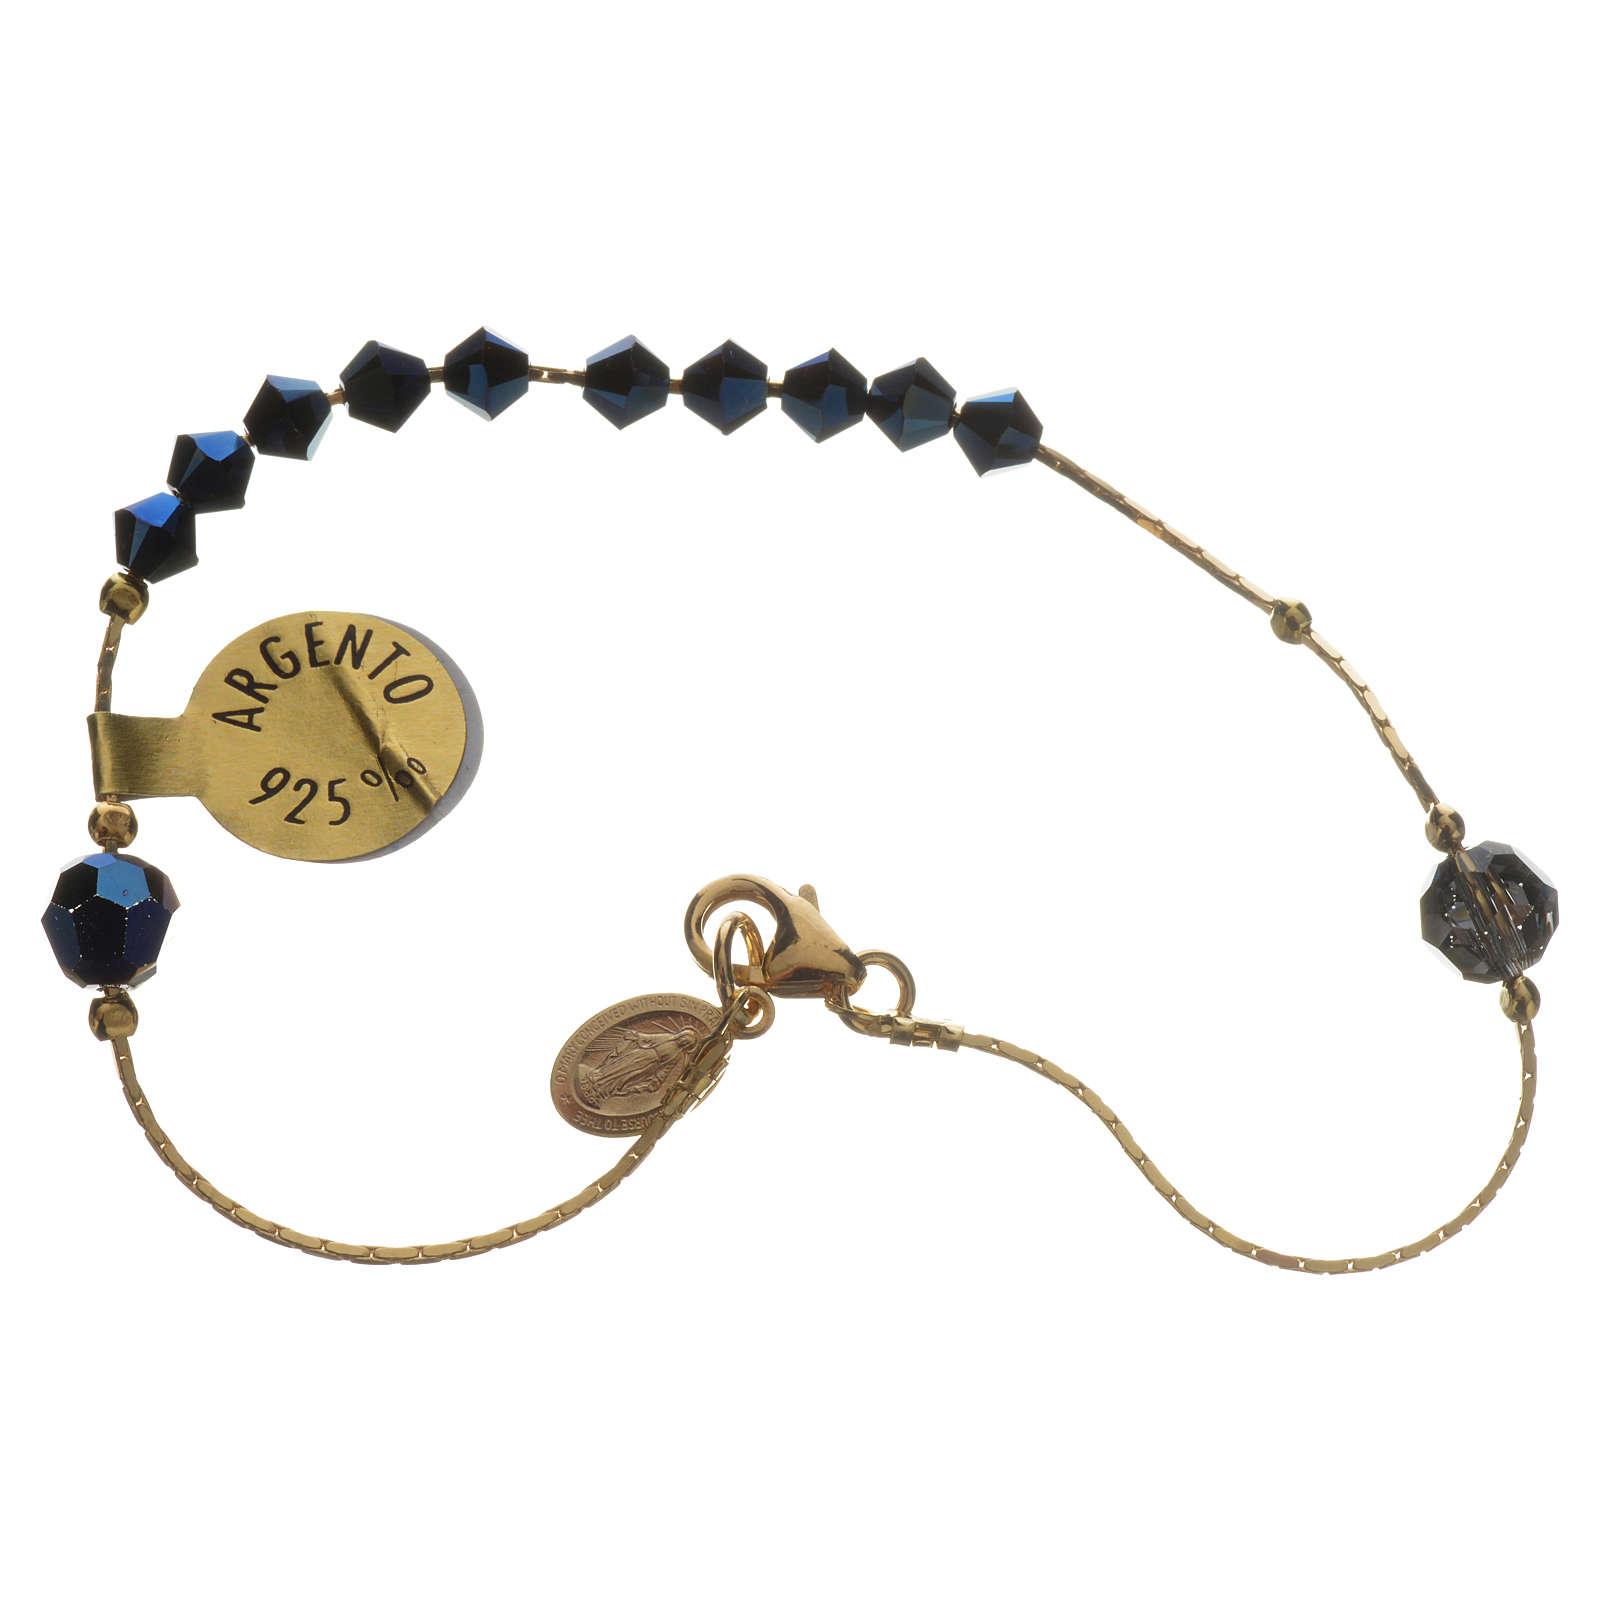 Bracelet, One Decade rosary beads, sterling silver and Swarovski 4